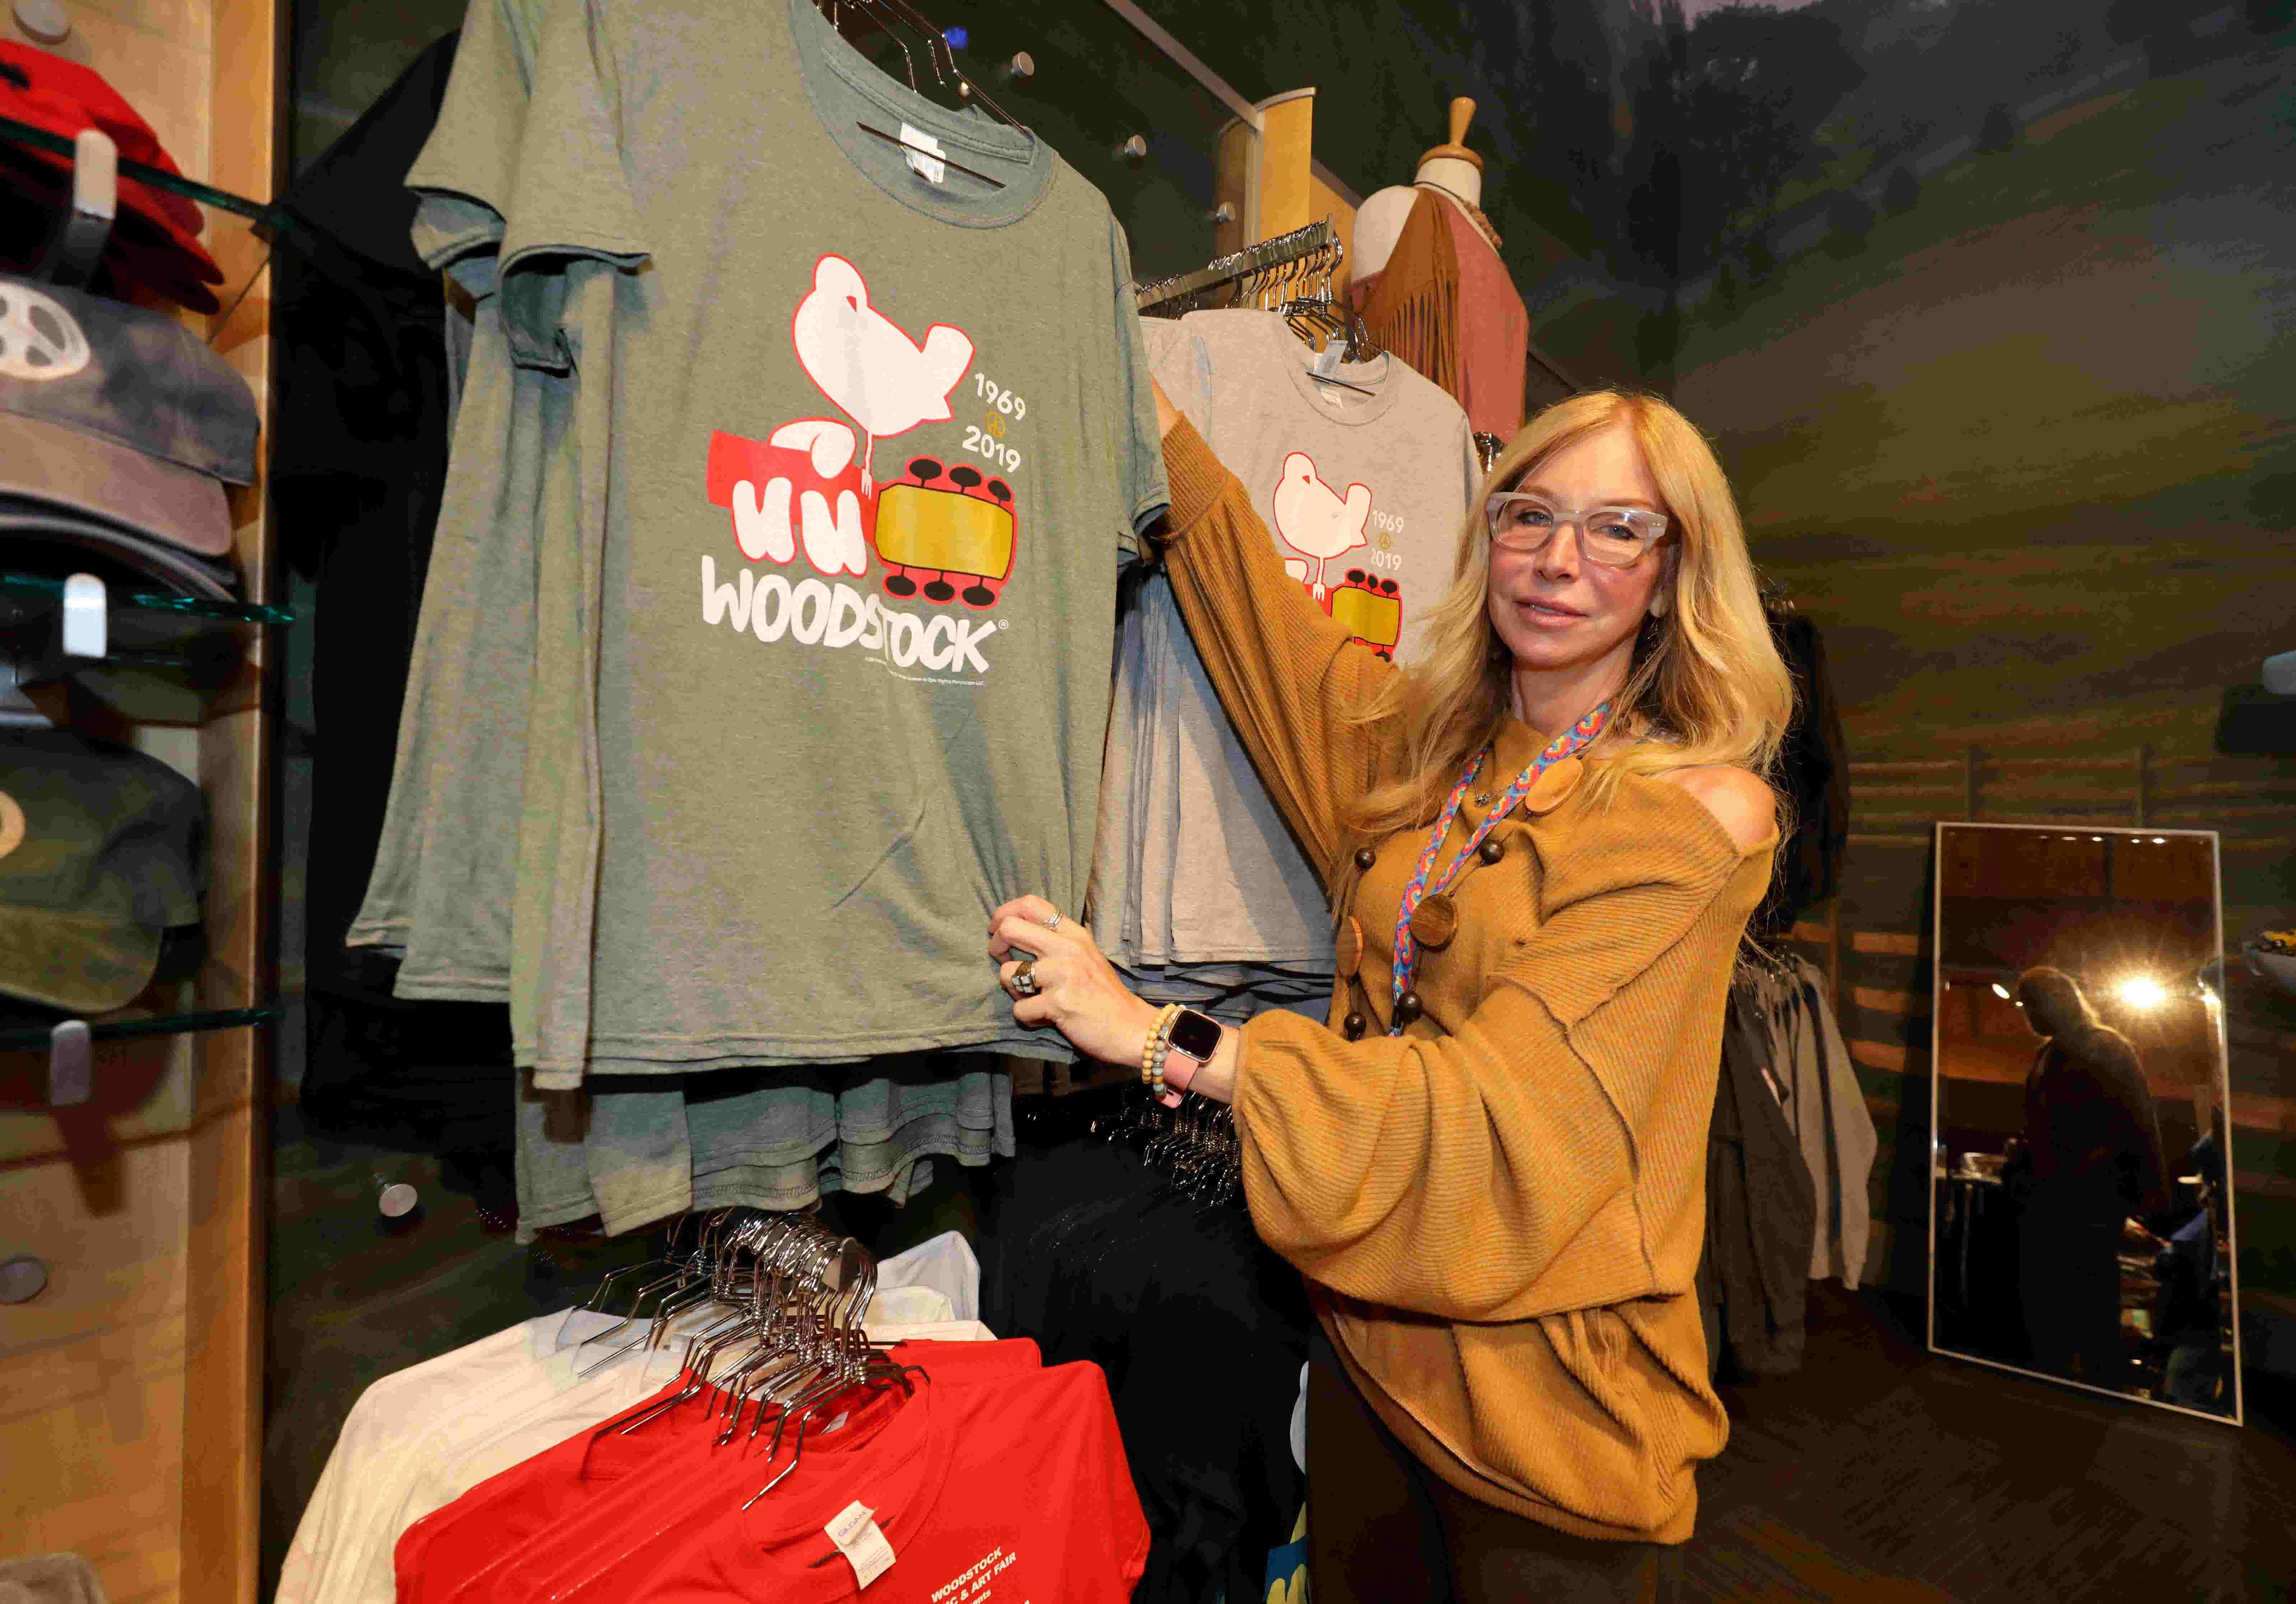 Woodstock merchandise and commerce